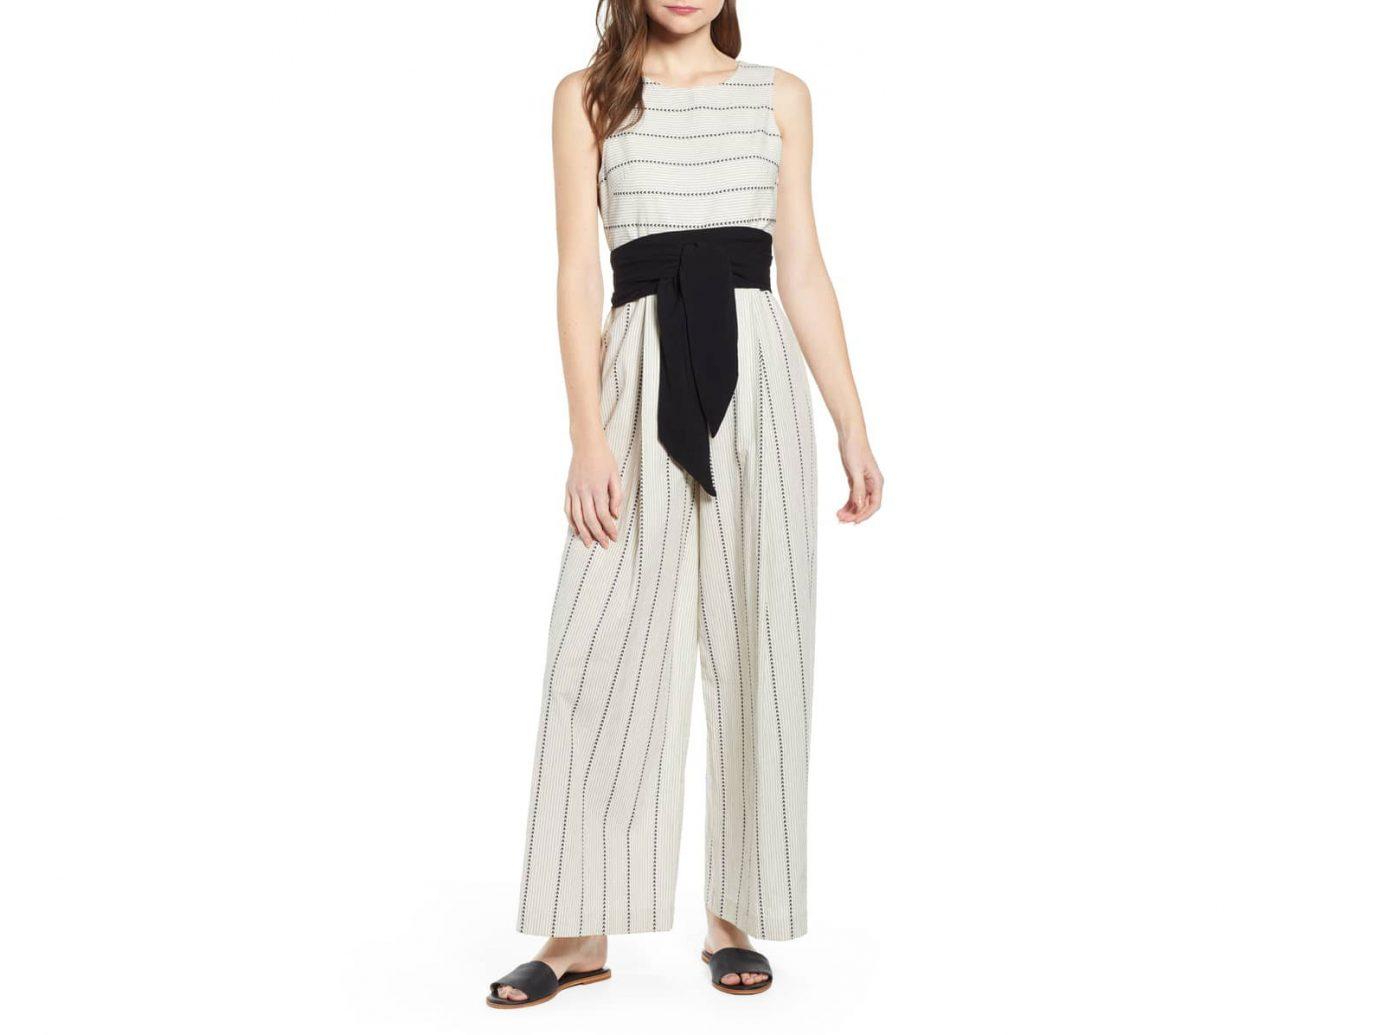 Damsel x THE ODELLS Stripe Wide Leg Cotton Jumpsuit